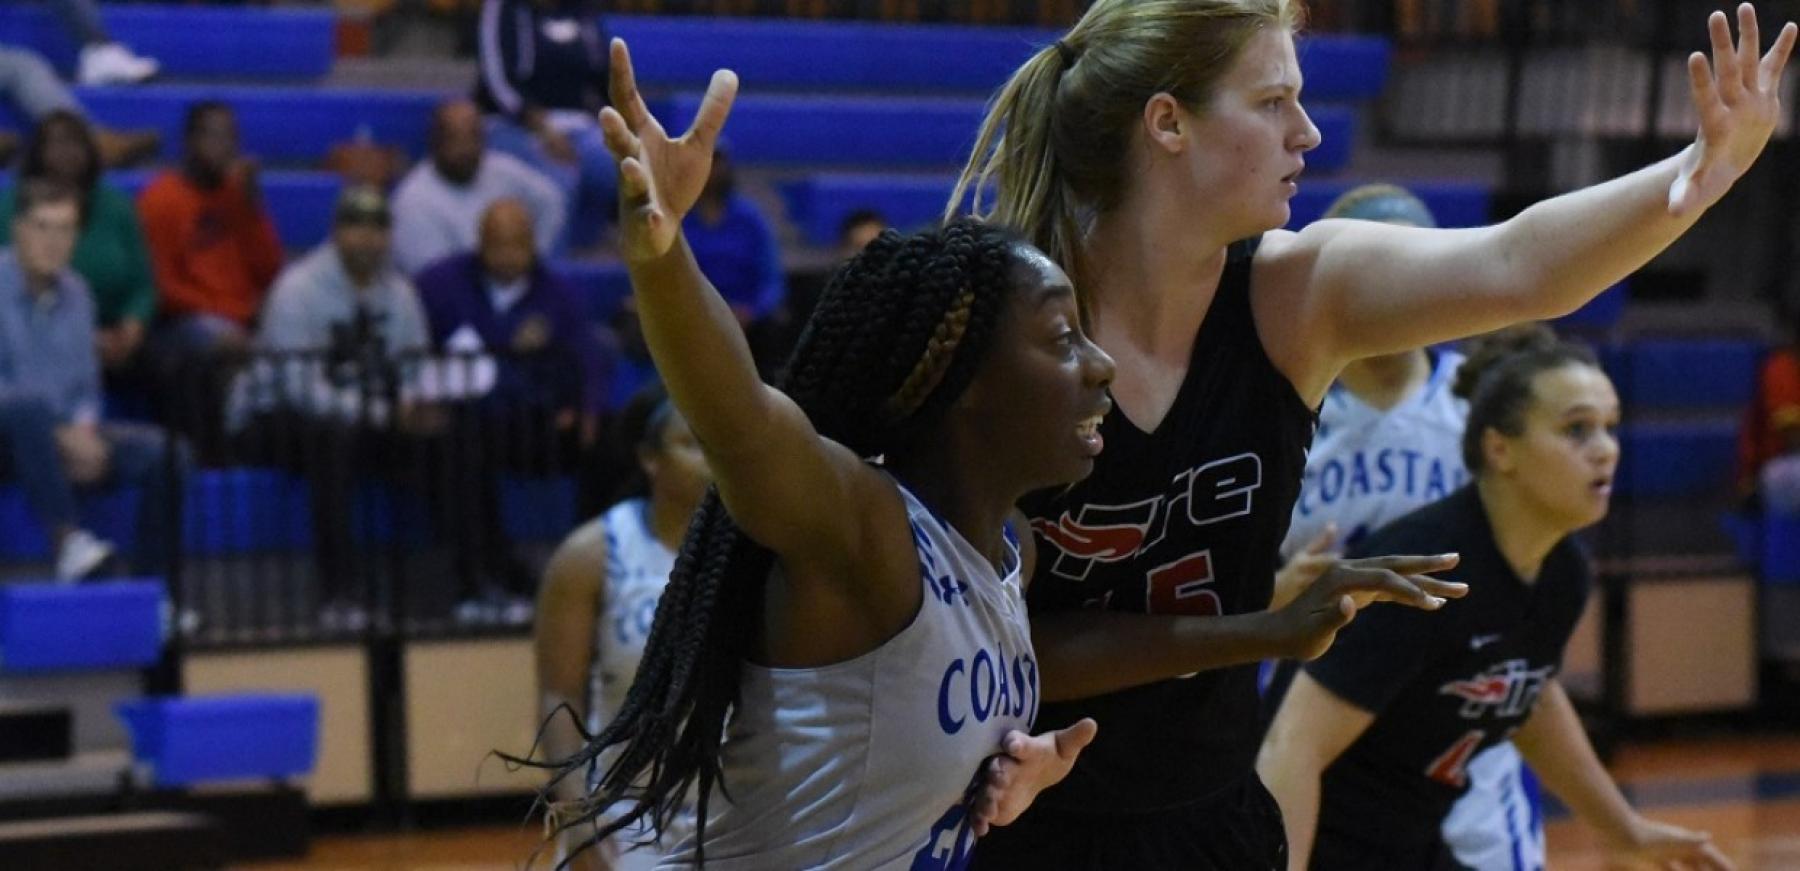 fb8bda22 2019-20 Women's Basketball   College of Coastal Georgia Athletics